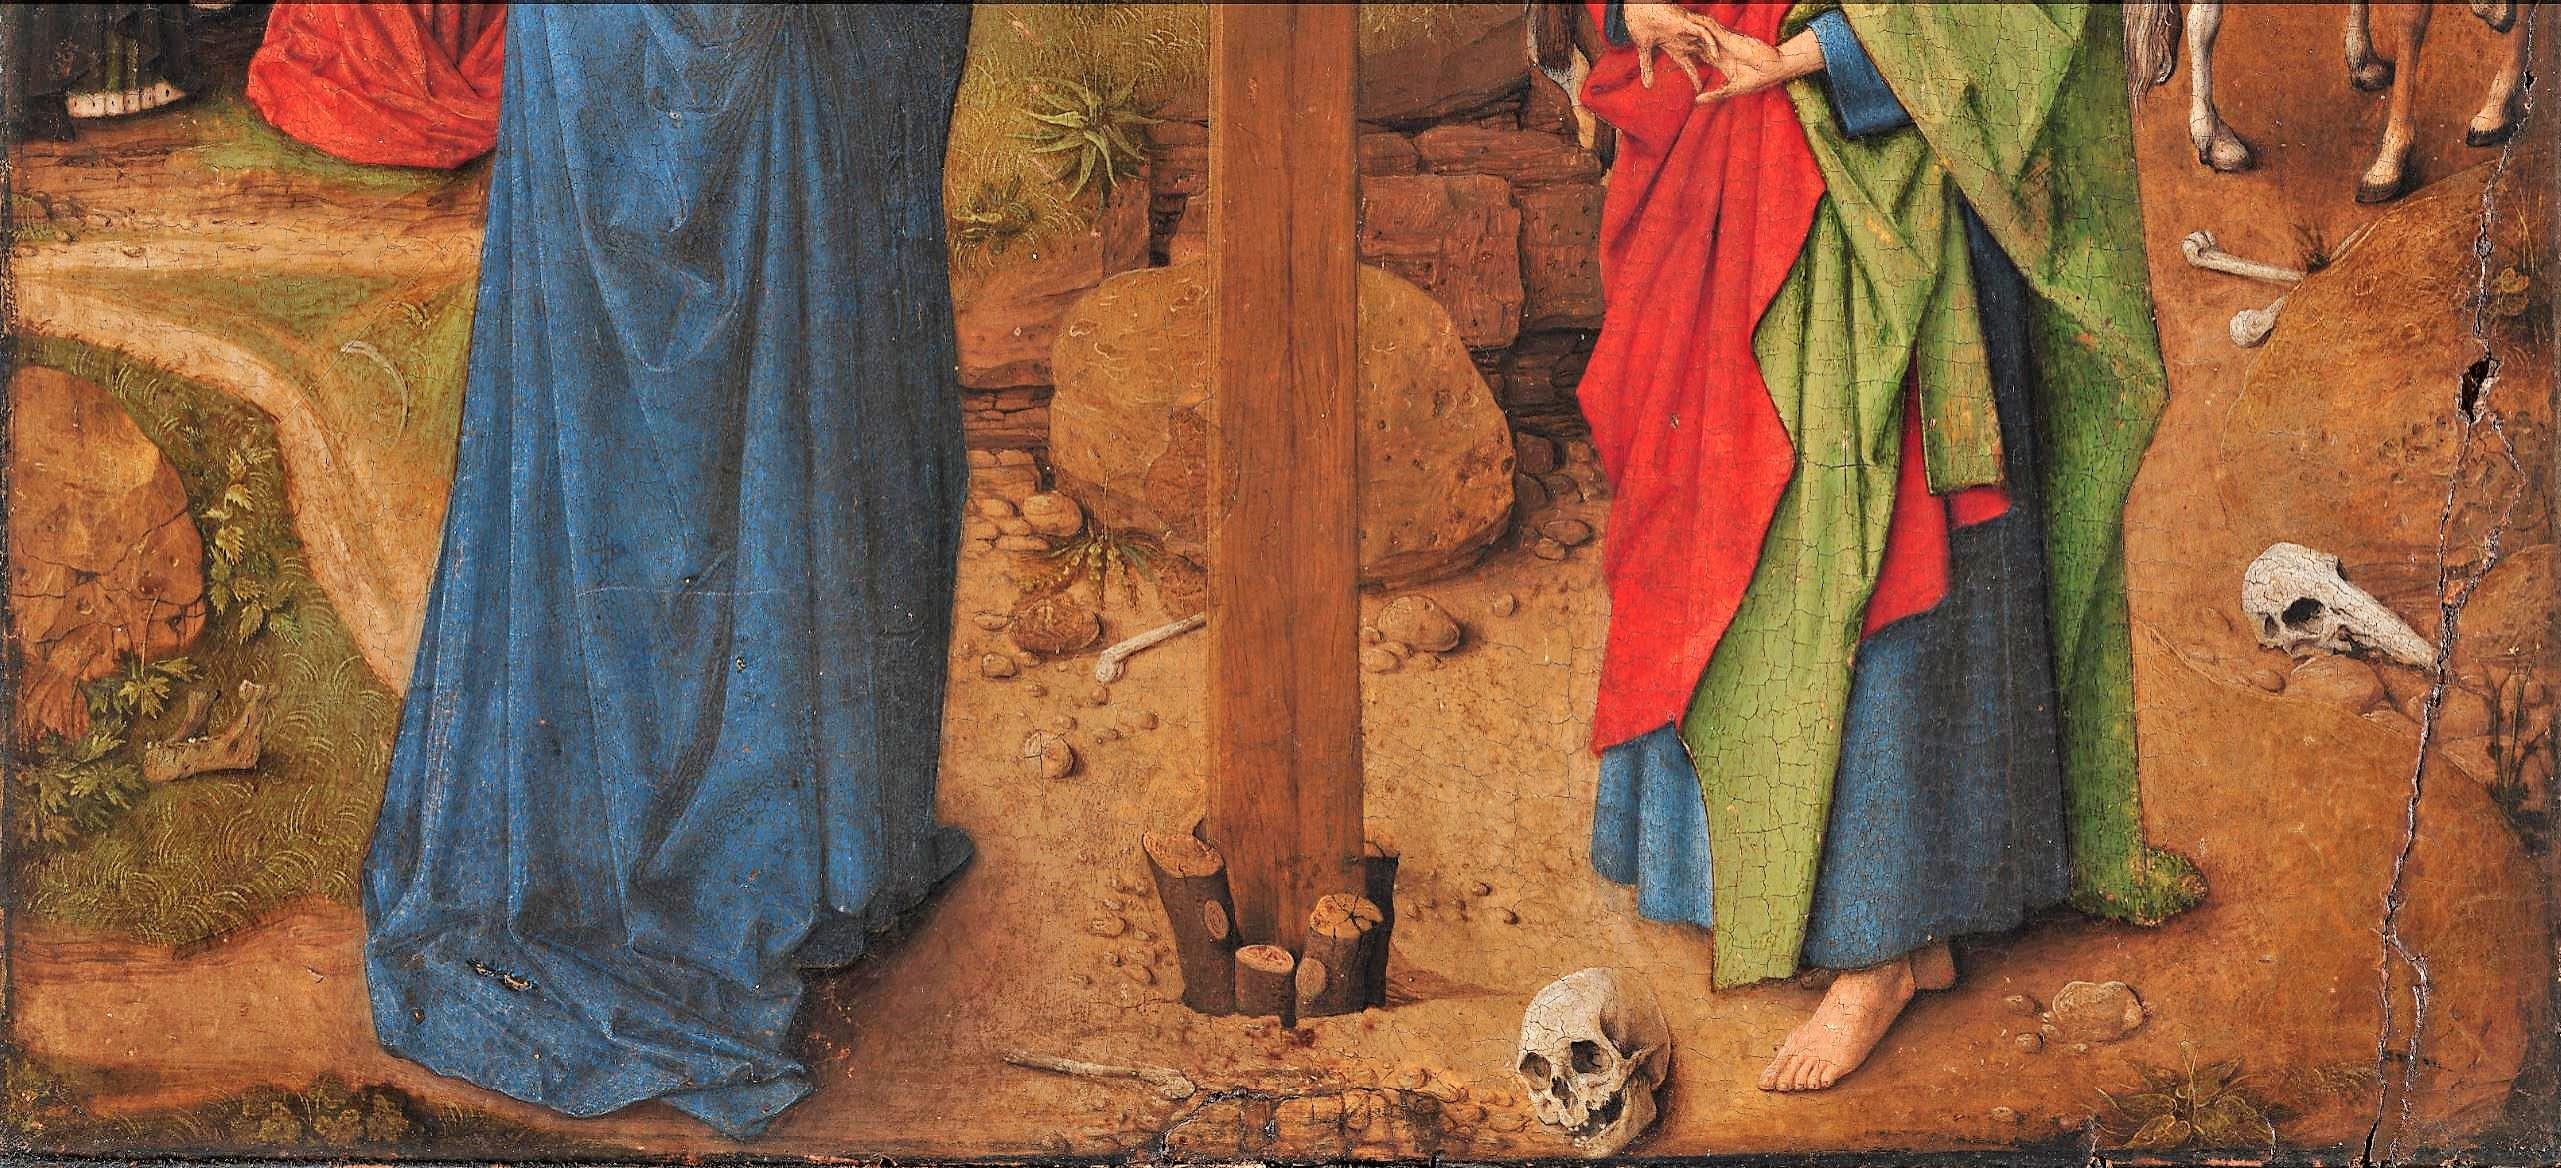 Van Eyck atelier 1440-50 Crucifixion Ca d'oro Venise bas